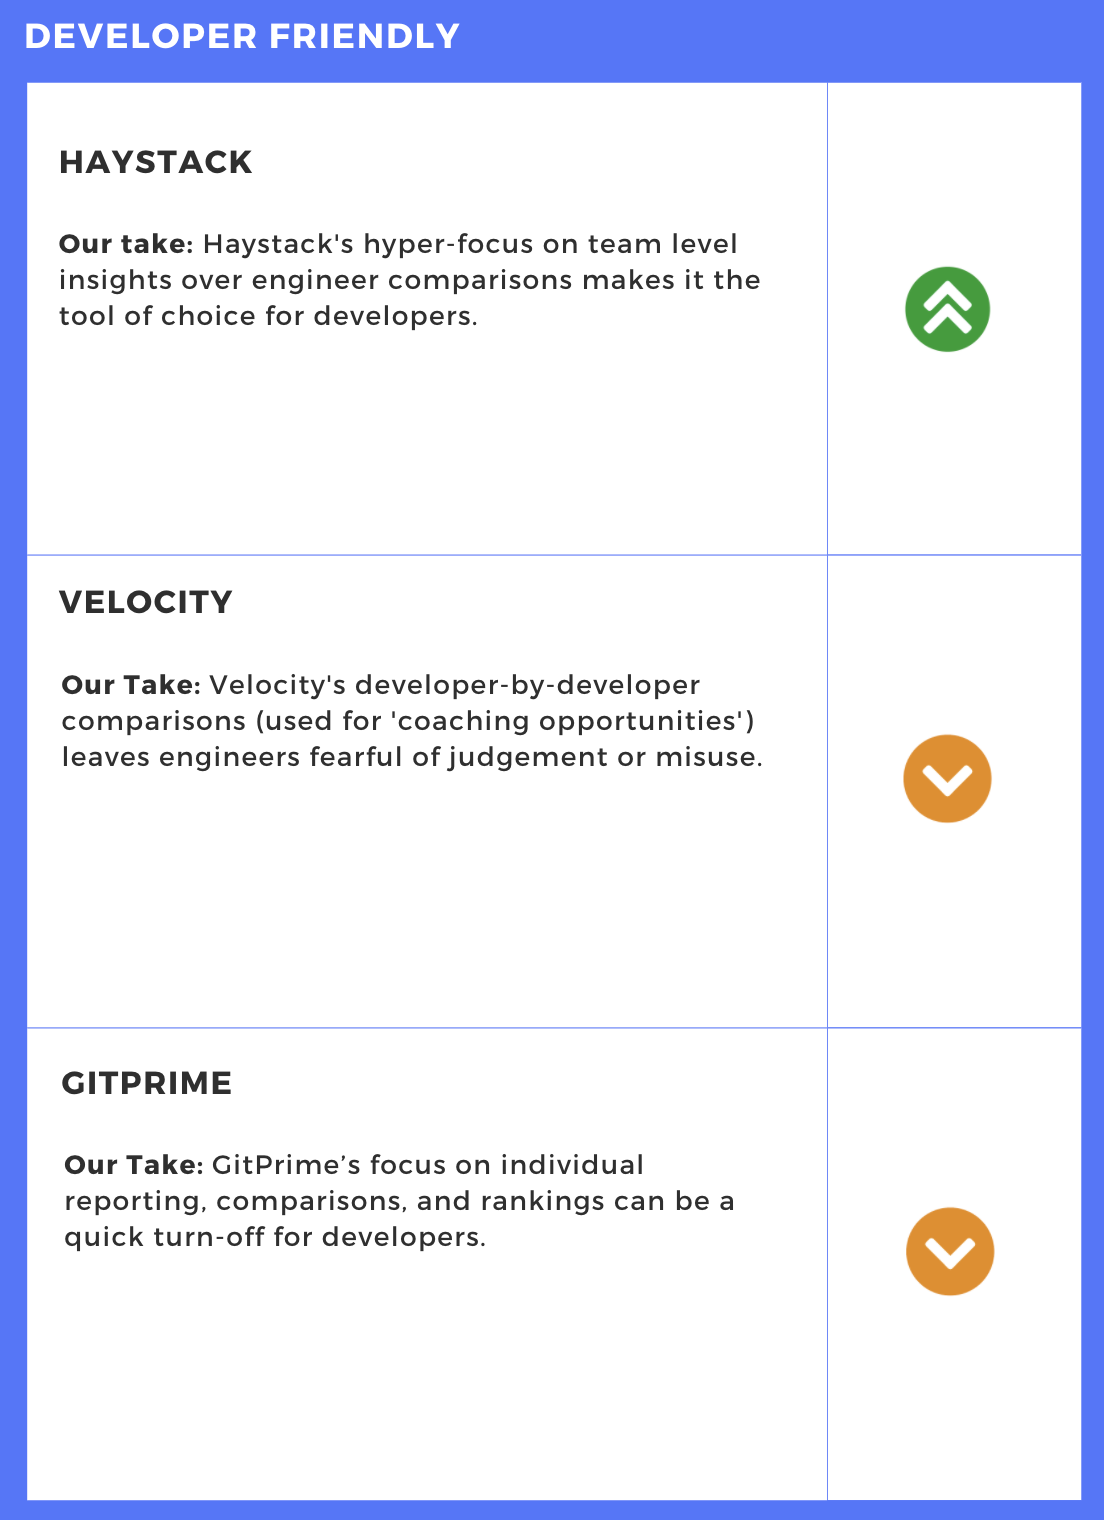 Developer Friendly Comparison - Engineering Intelligence Tools